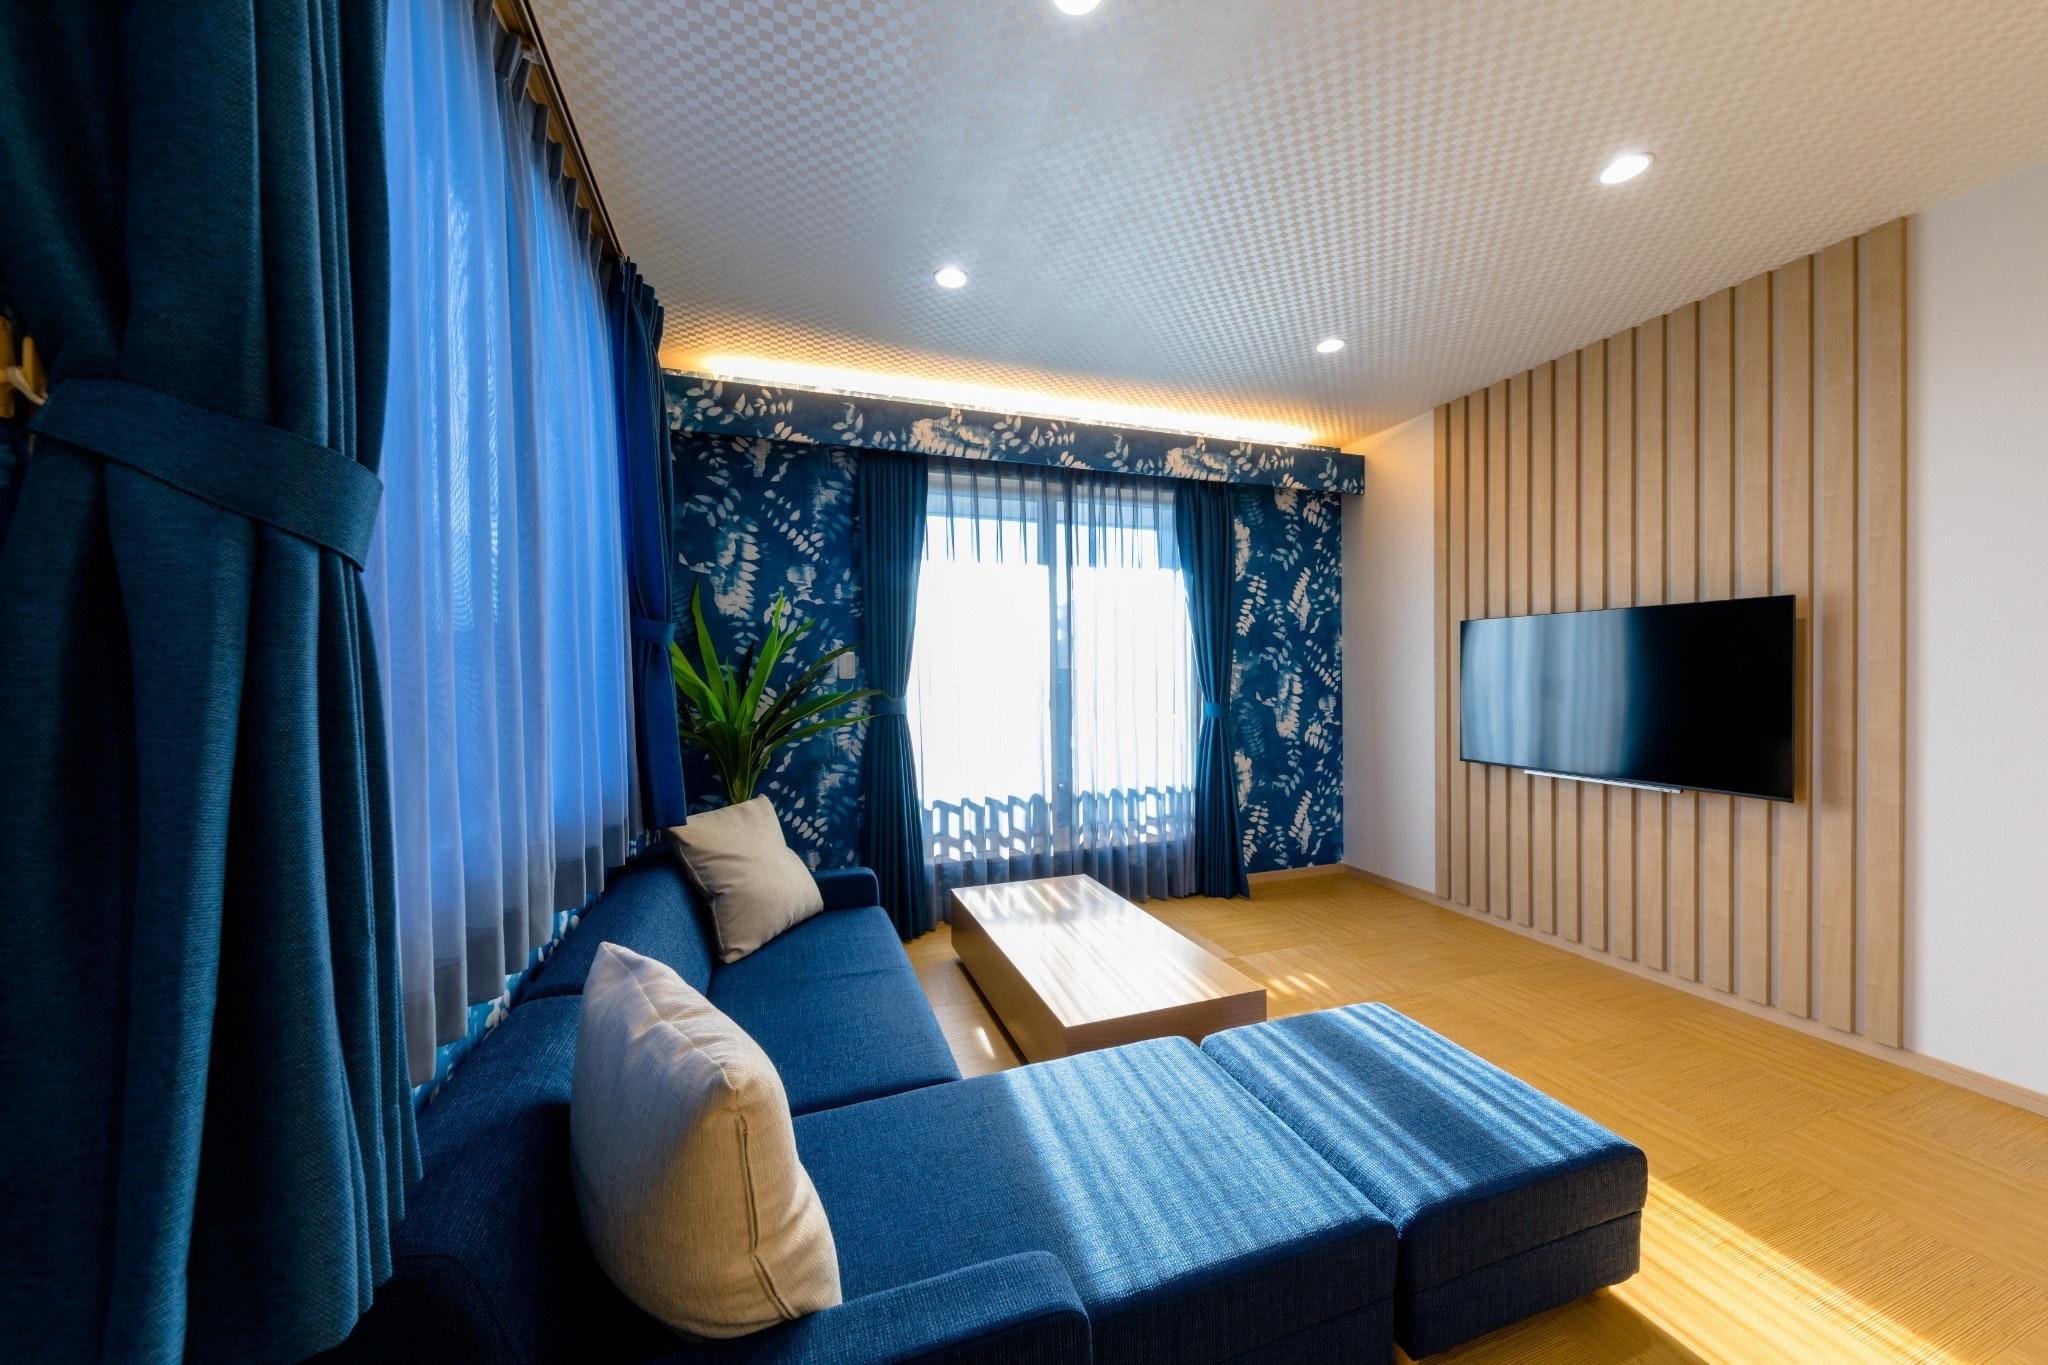 Resort Club-蒼- 富士山展望高級リゾートヴィラ 河口湖&富士急最適!